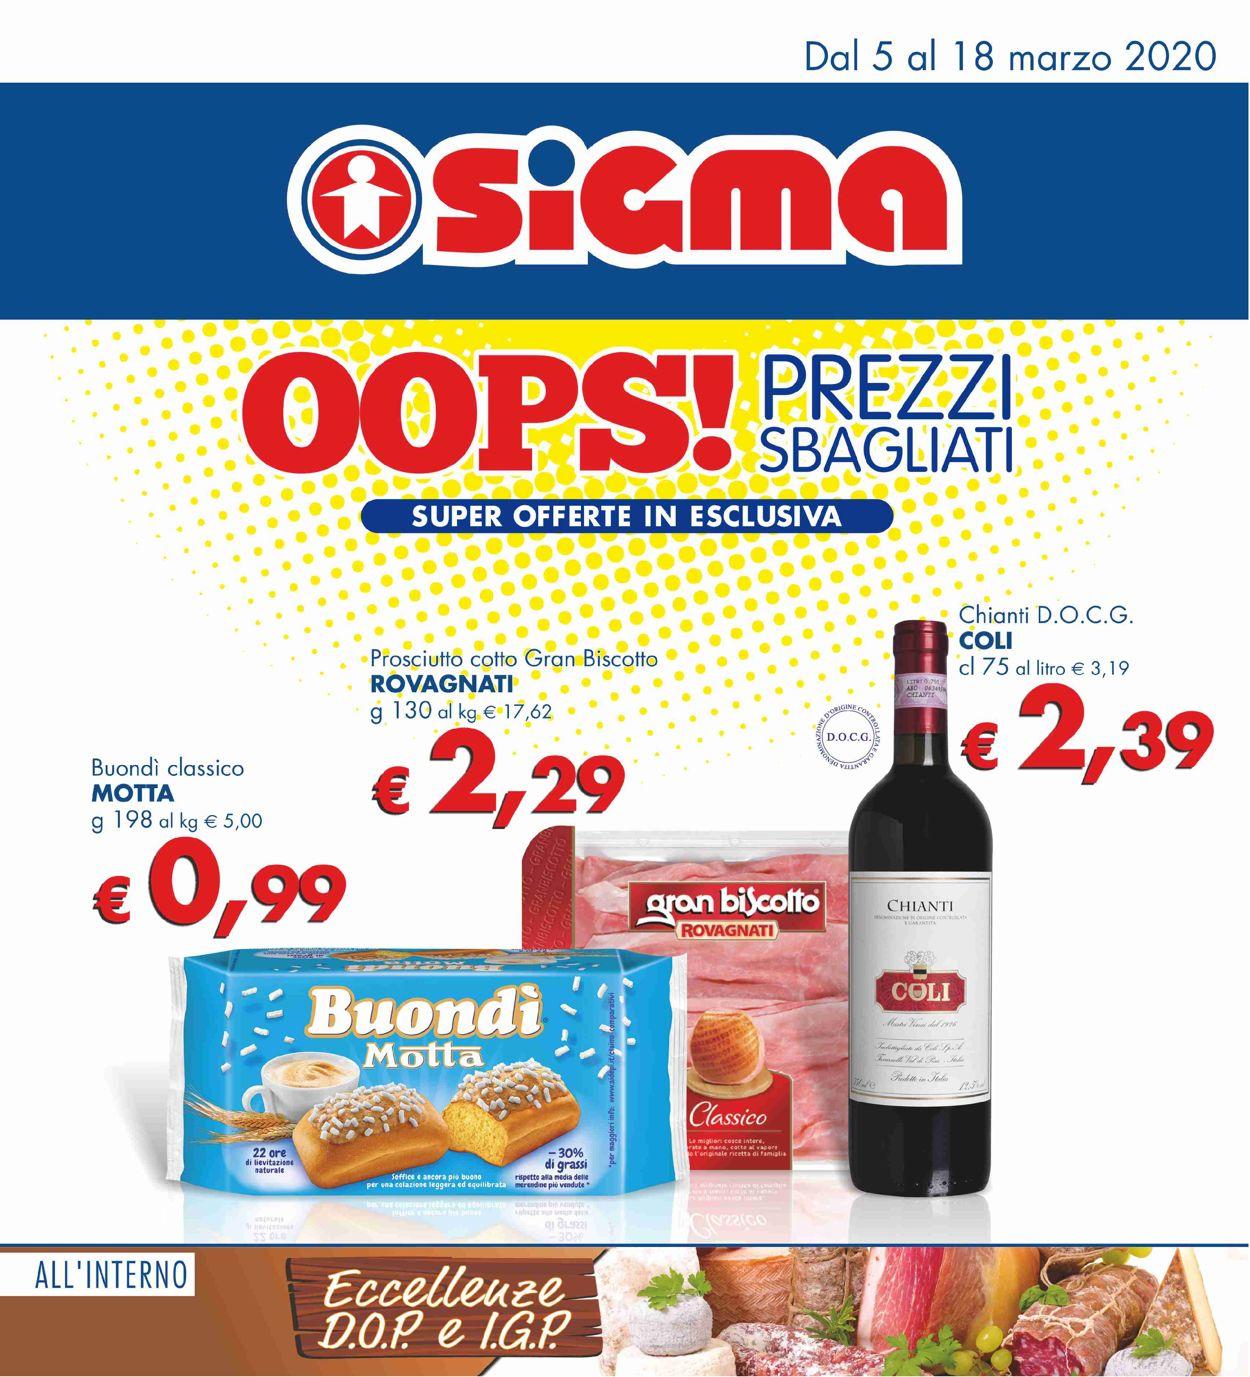 Volantino Sigma - Offerte 05/03-18/03/2020